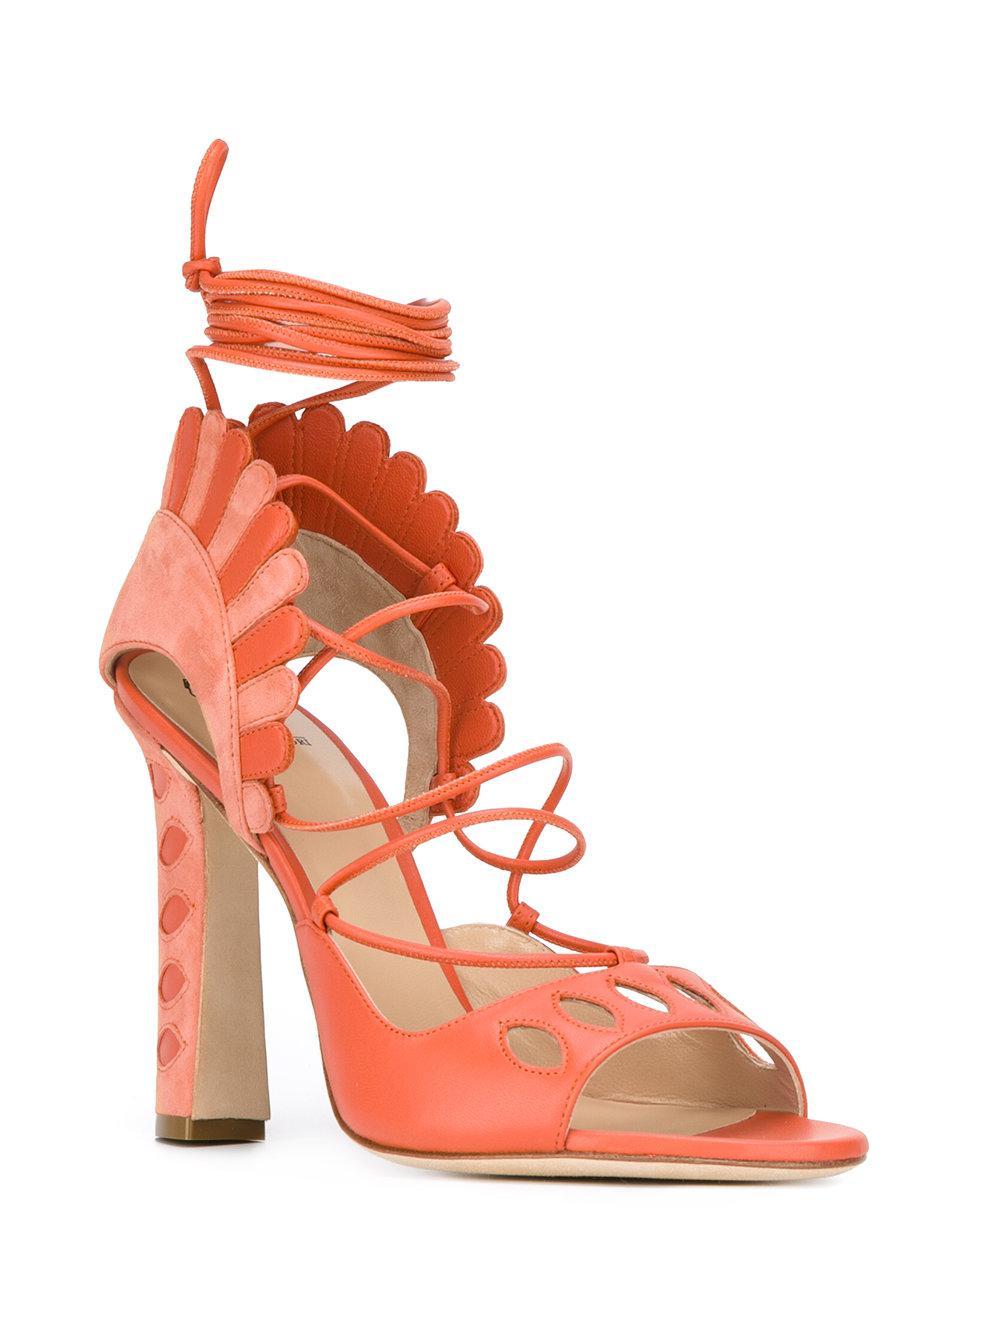 Lotus sandals - Yellow & Orange Paula Cademartori zYTDn